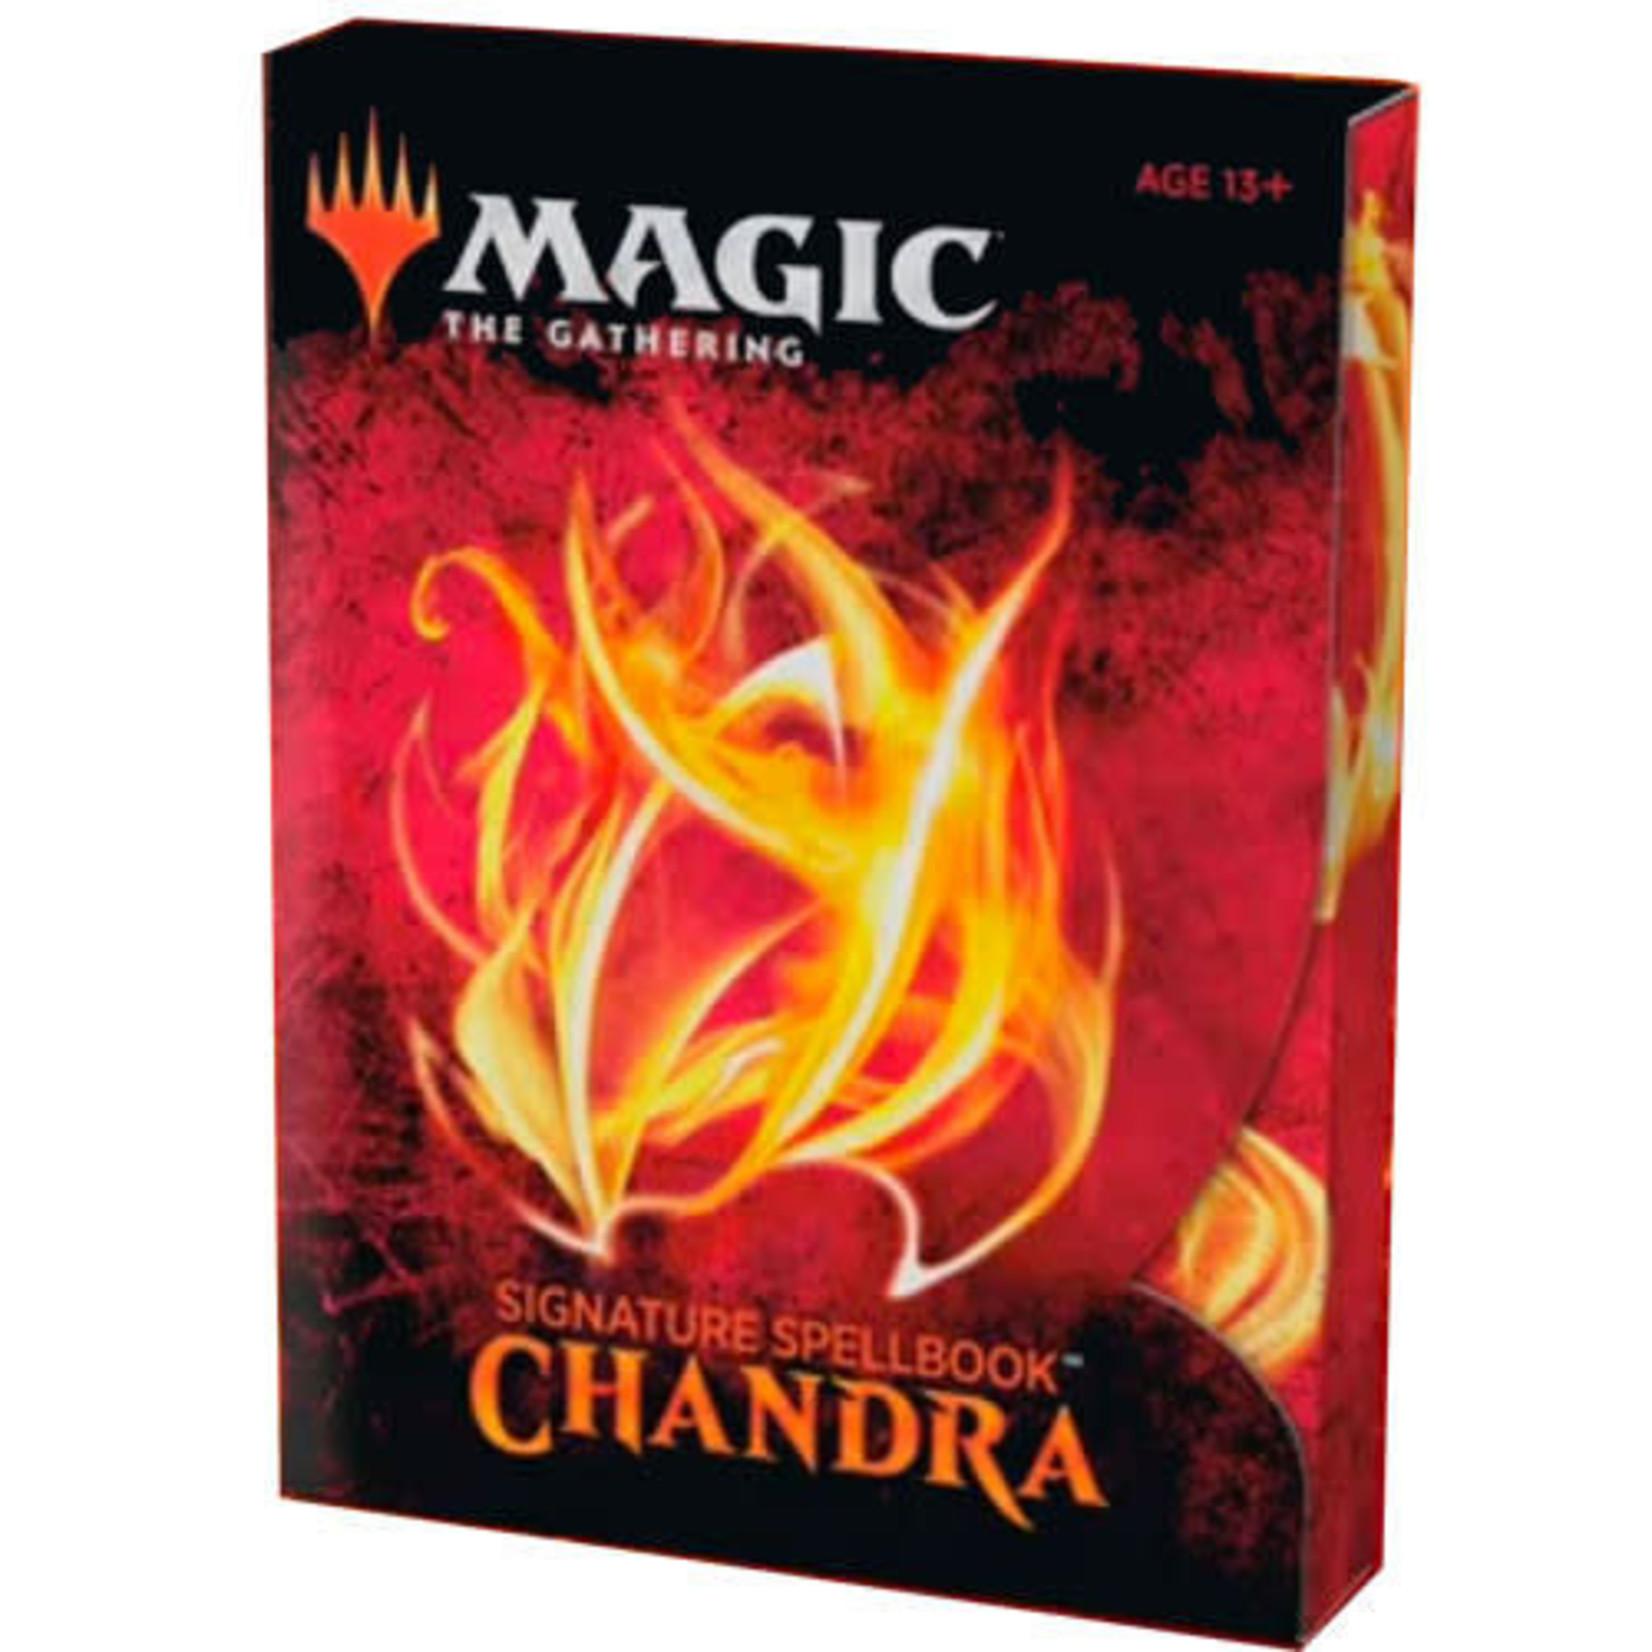 WOTC Signature Spellbook - Chandra